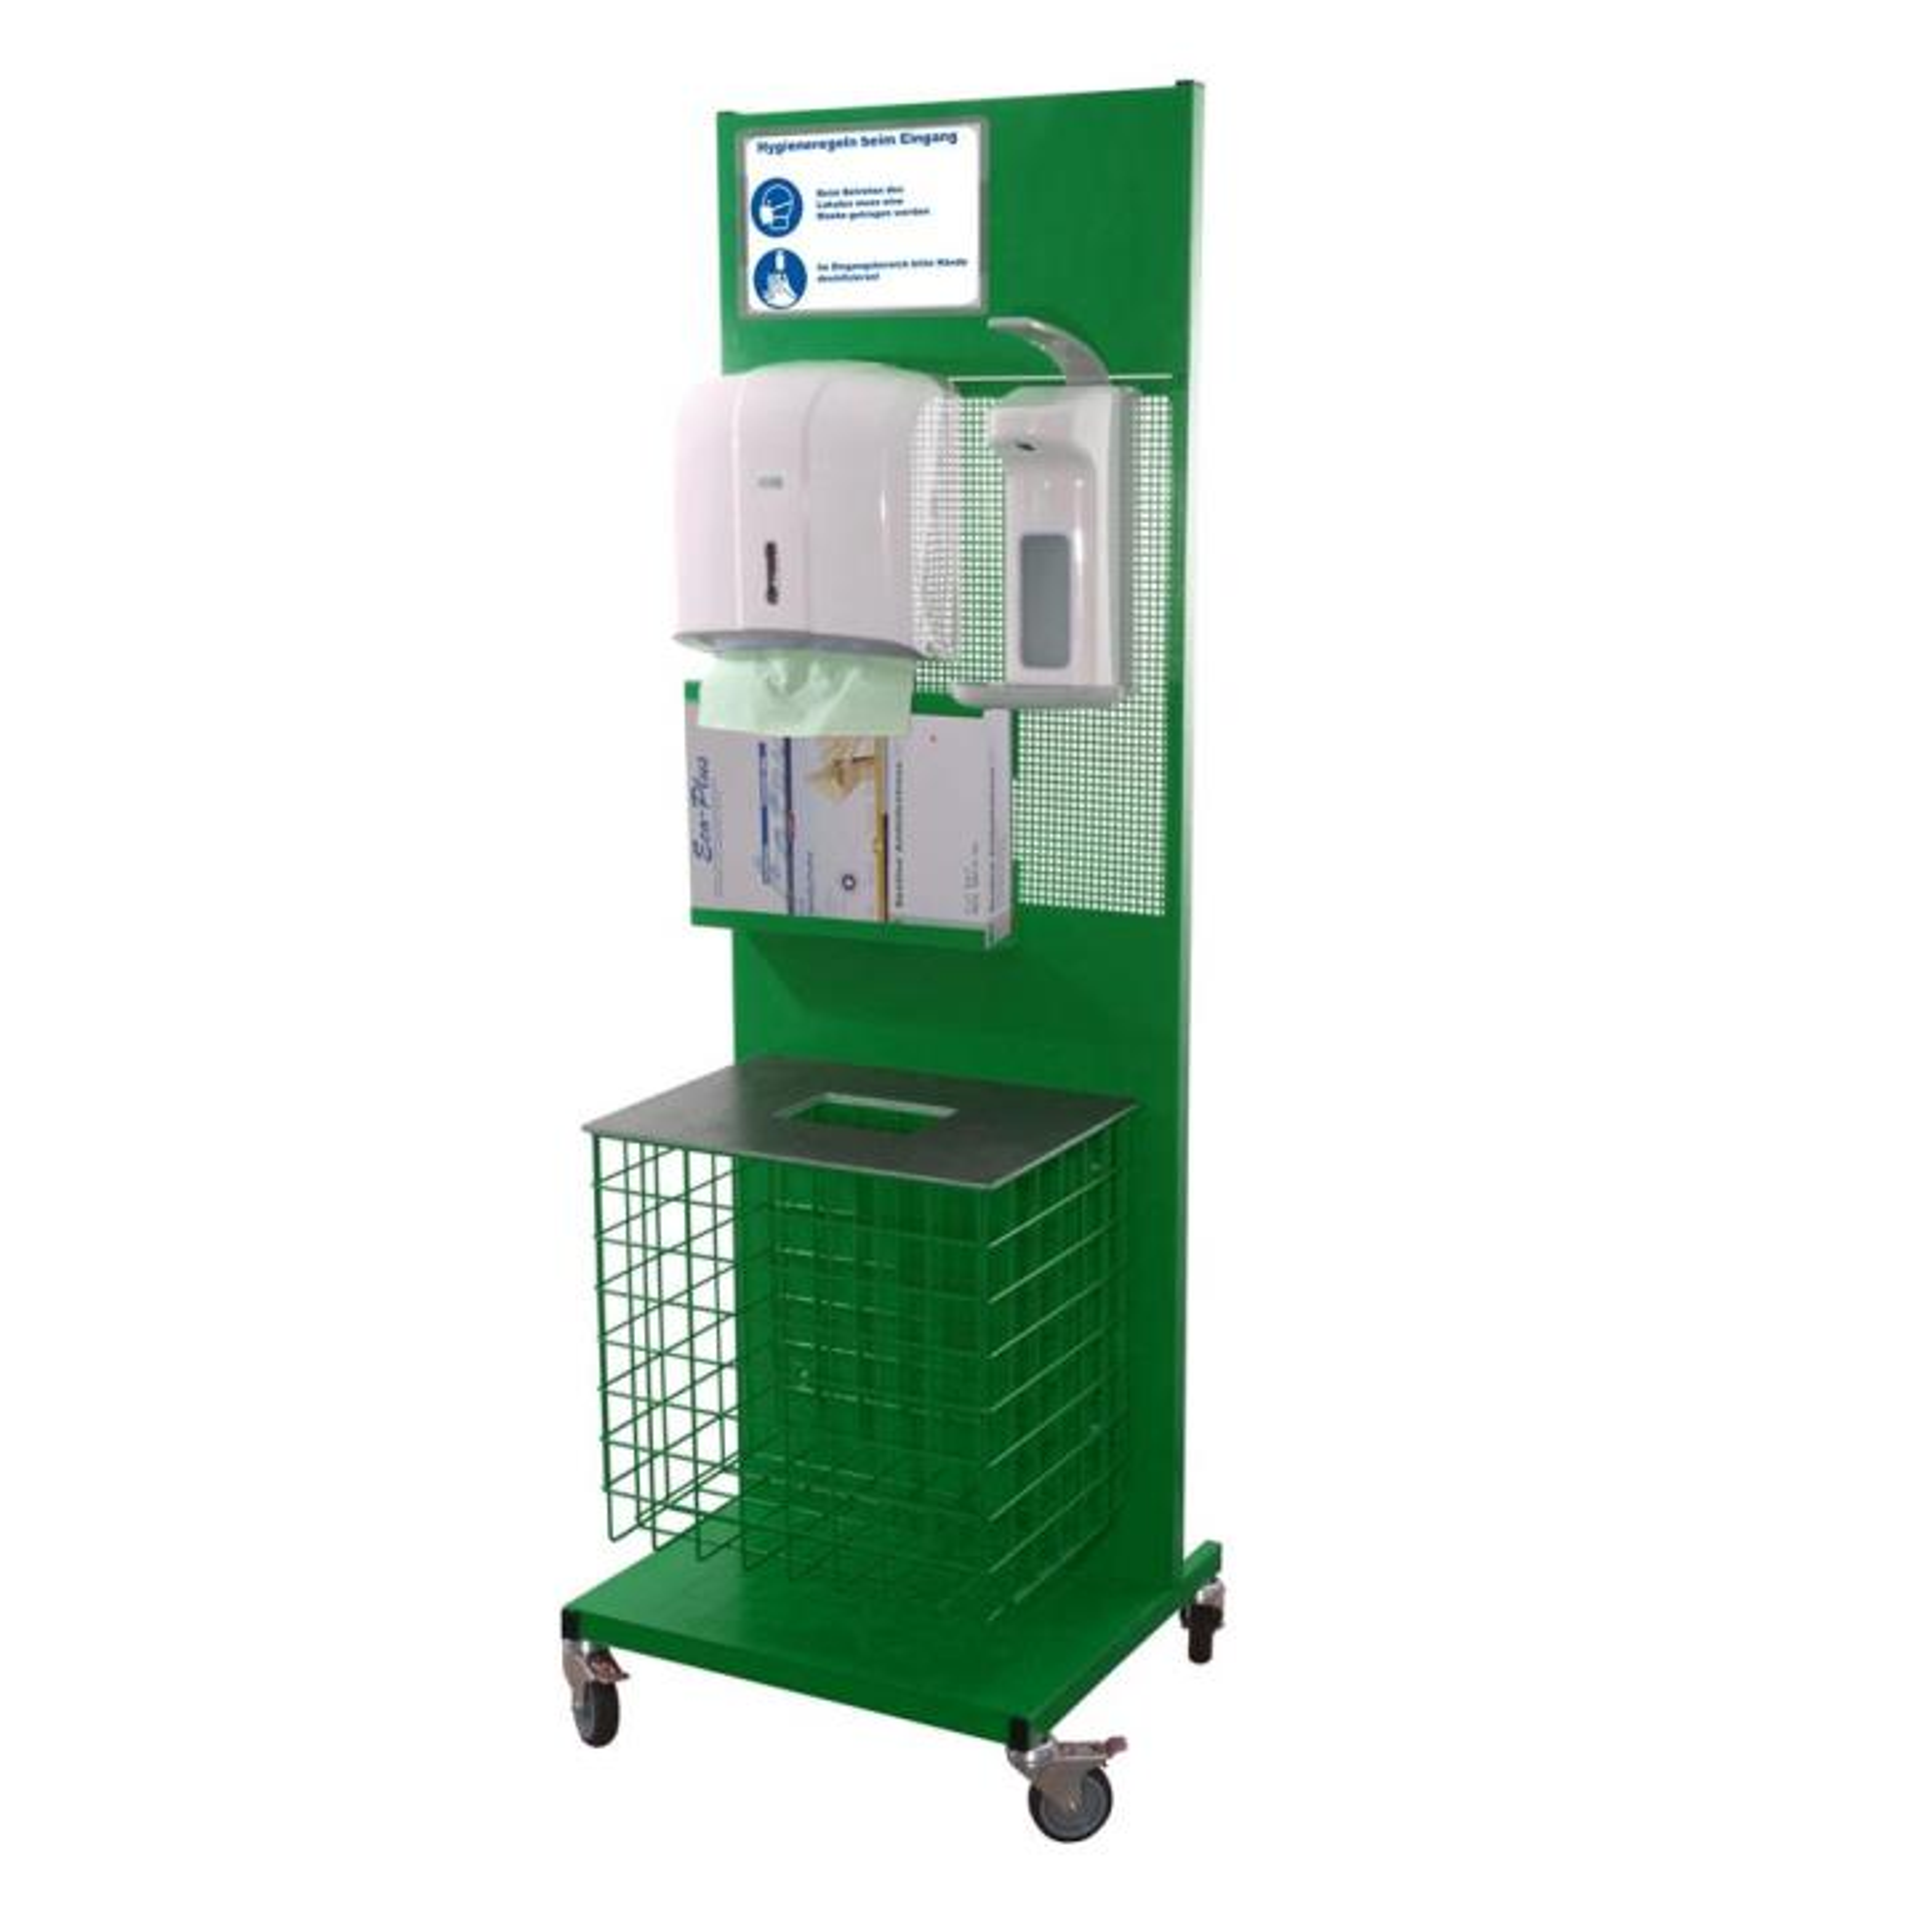 Hygienestation aus Metall Komplett RAL 6026